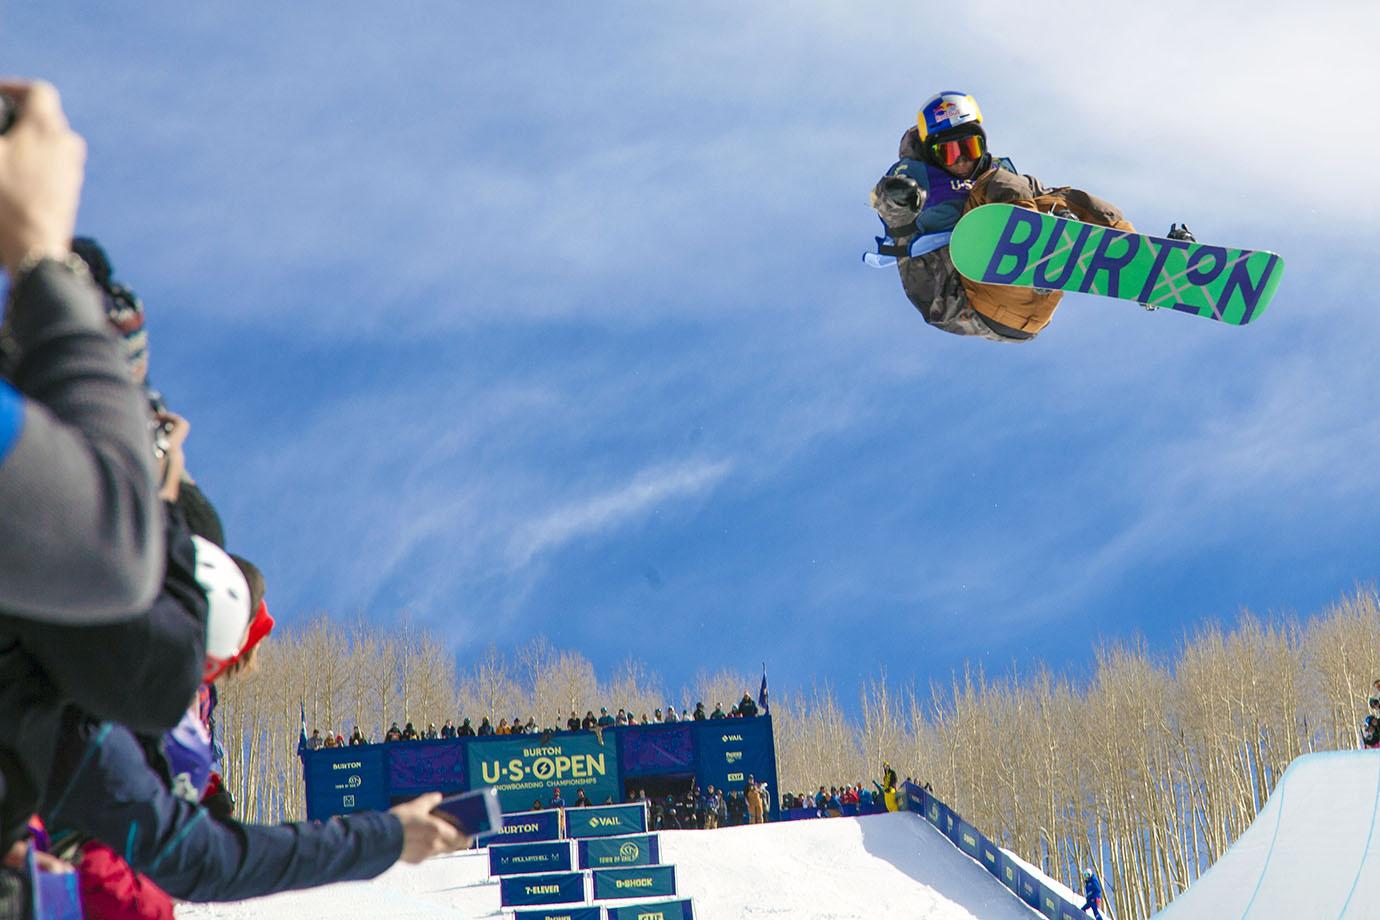 Taku Hiraoka takes third place in the men's snowboard final behind Ben Ferguson and Shaun White.